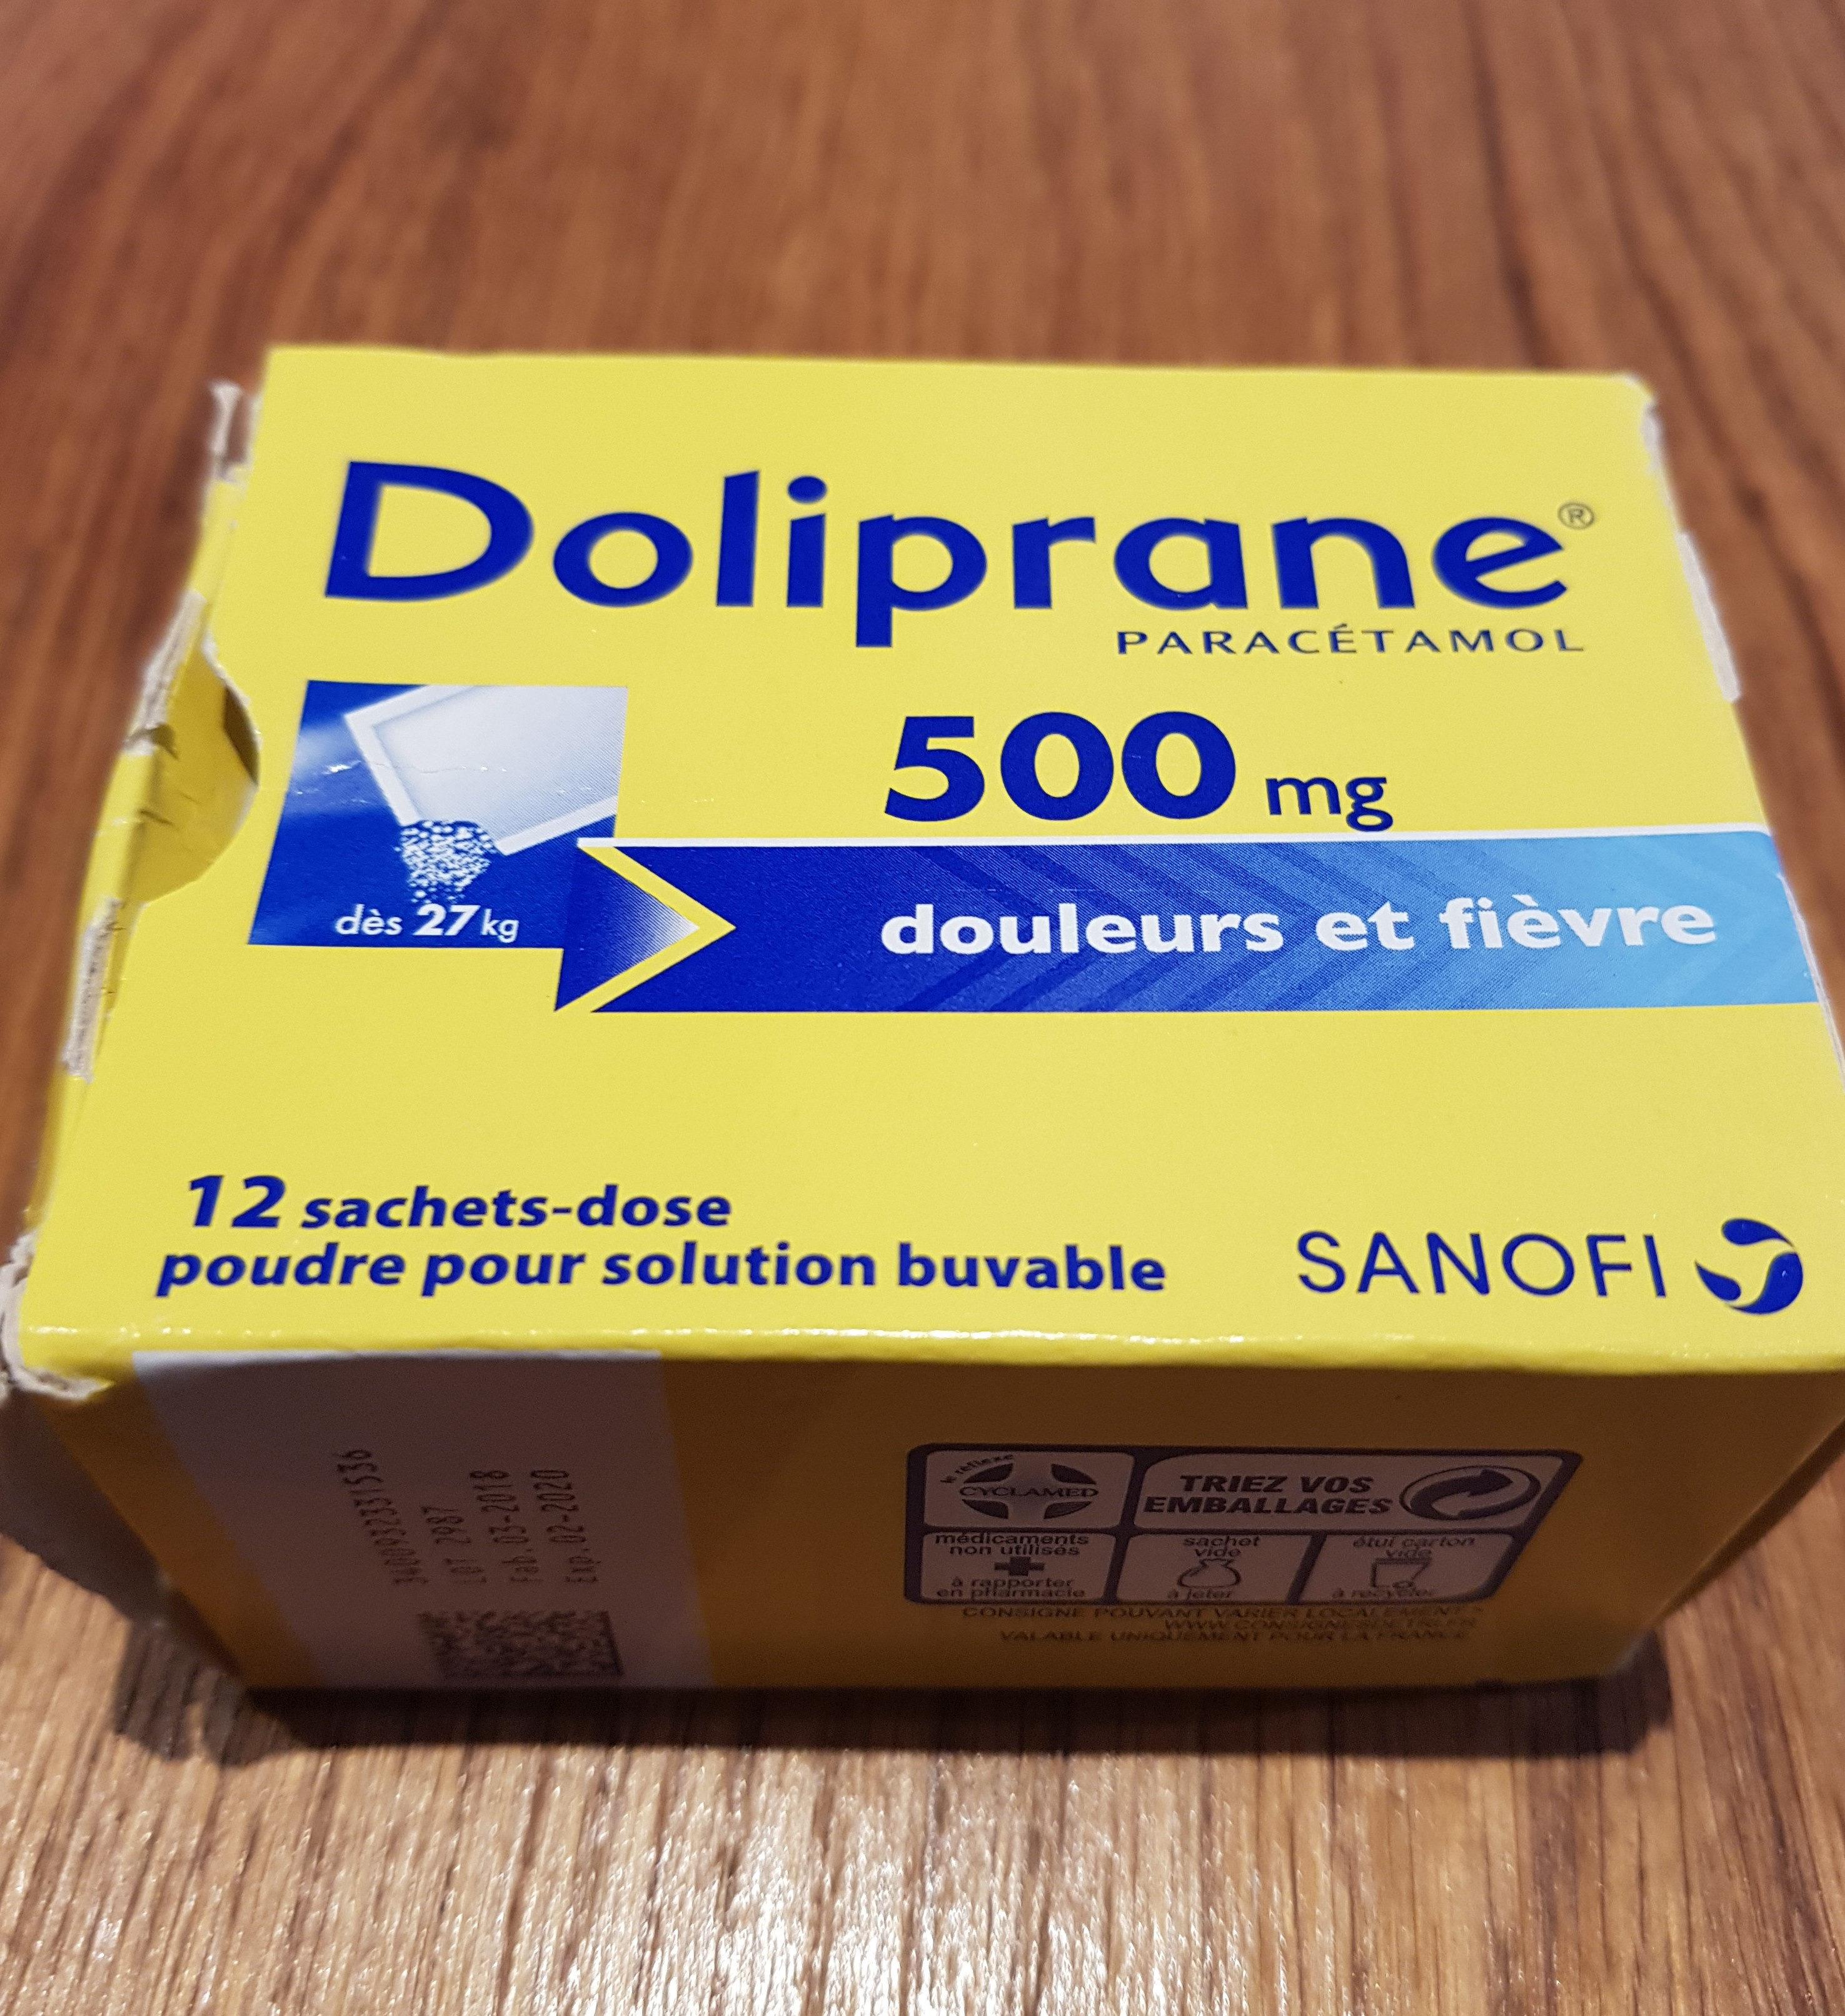 Doliprane 500 mg sachets-dose - Product - fr